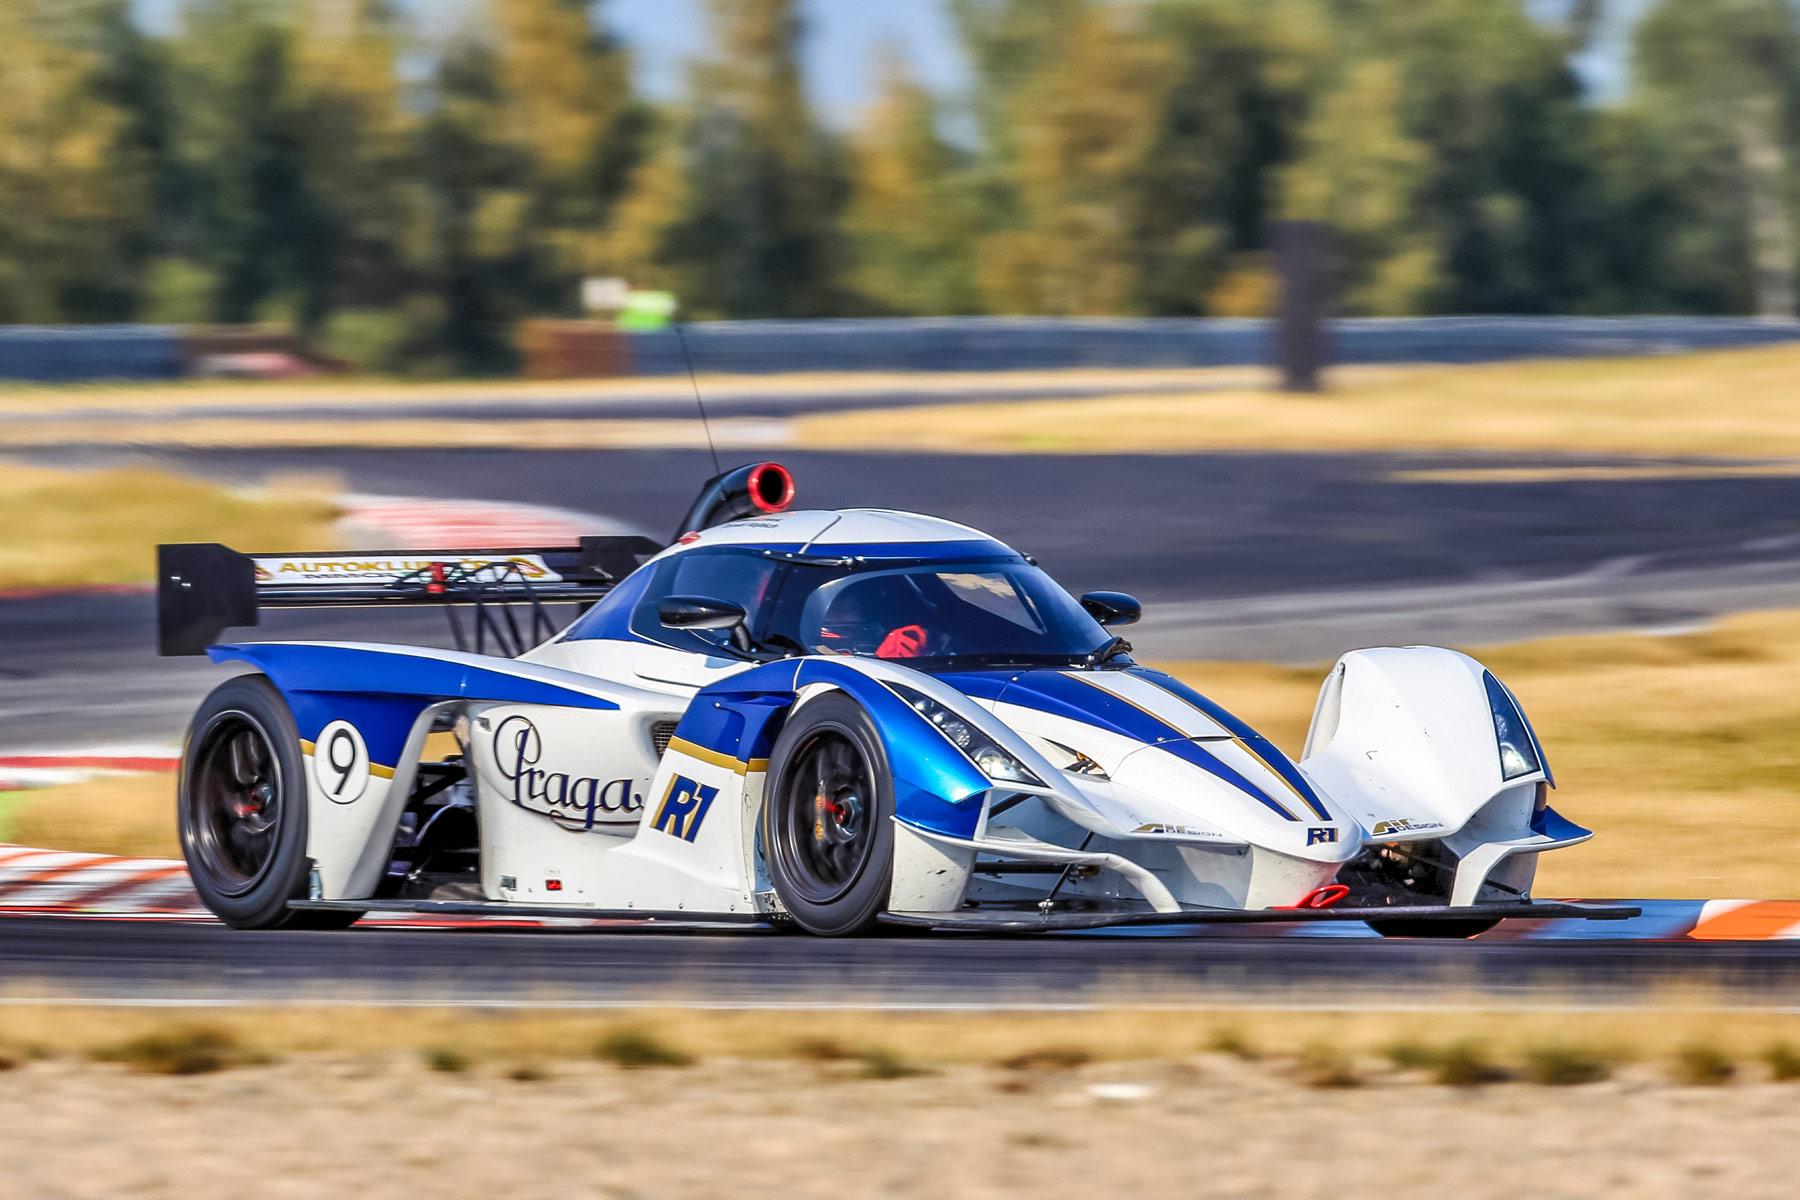 Praga R1 – Endurance champion of FIA-CEZ Most